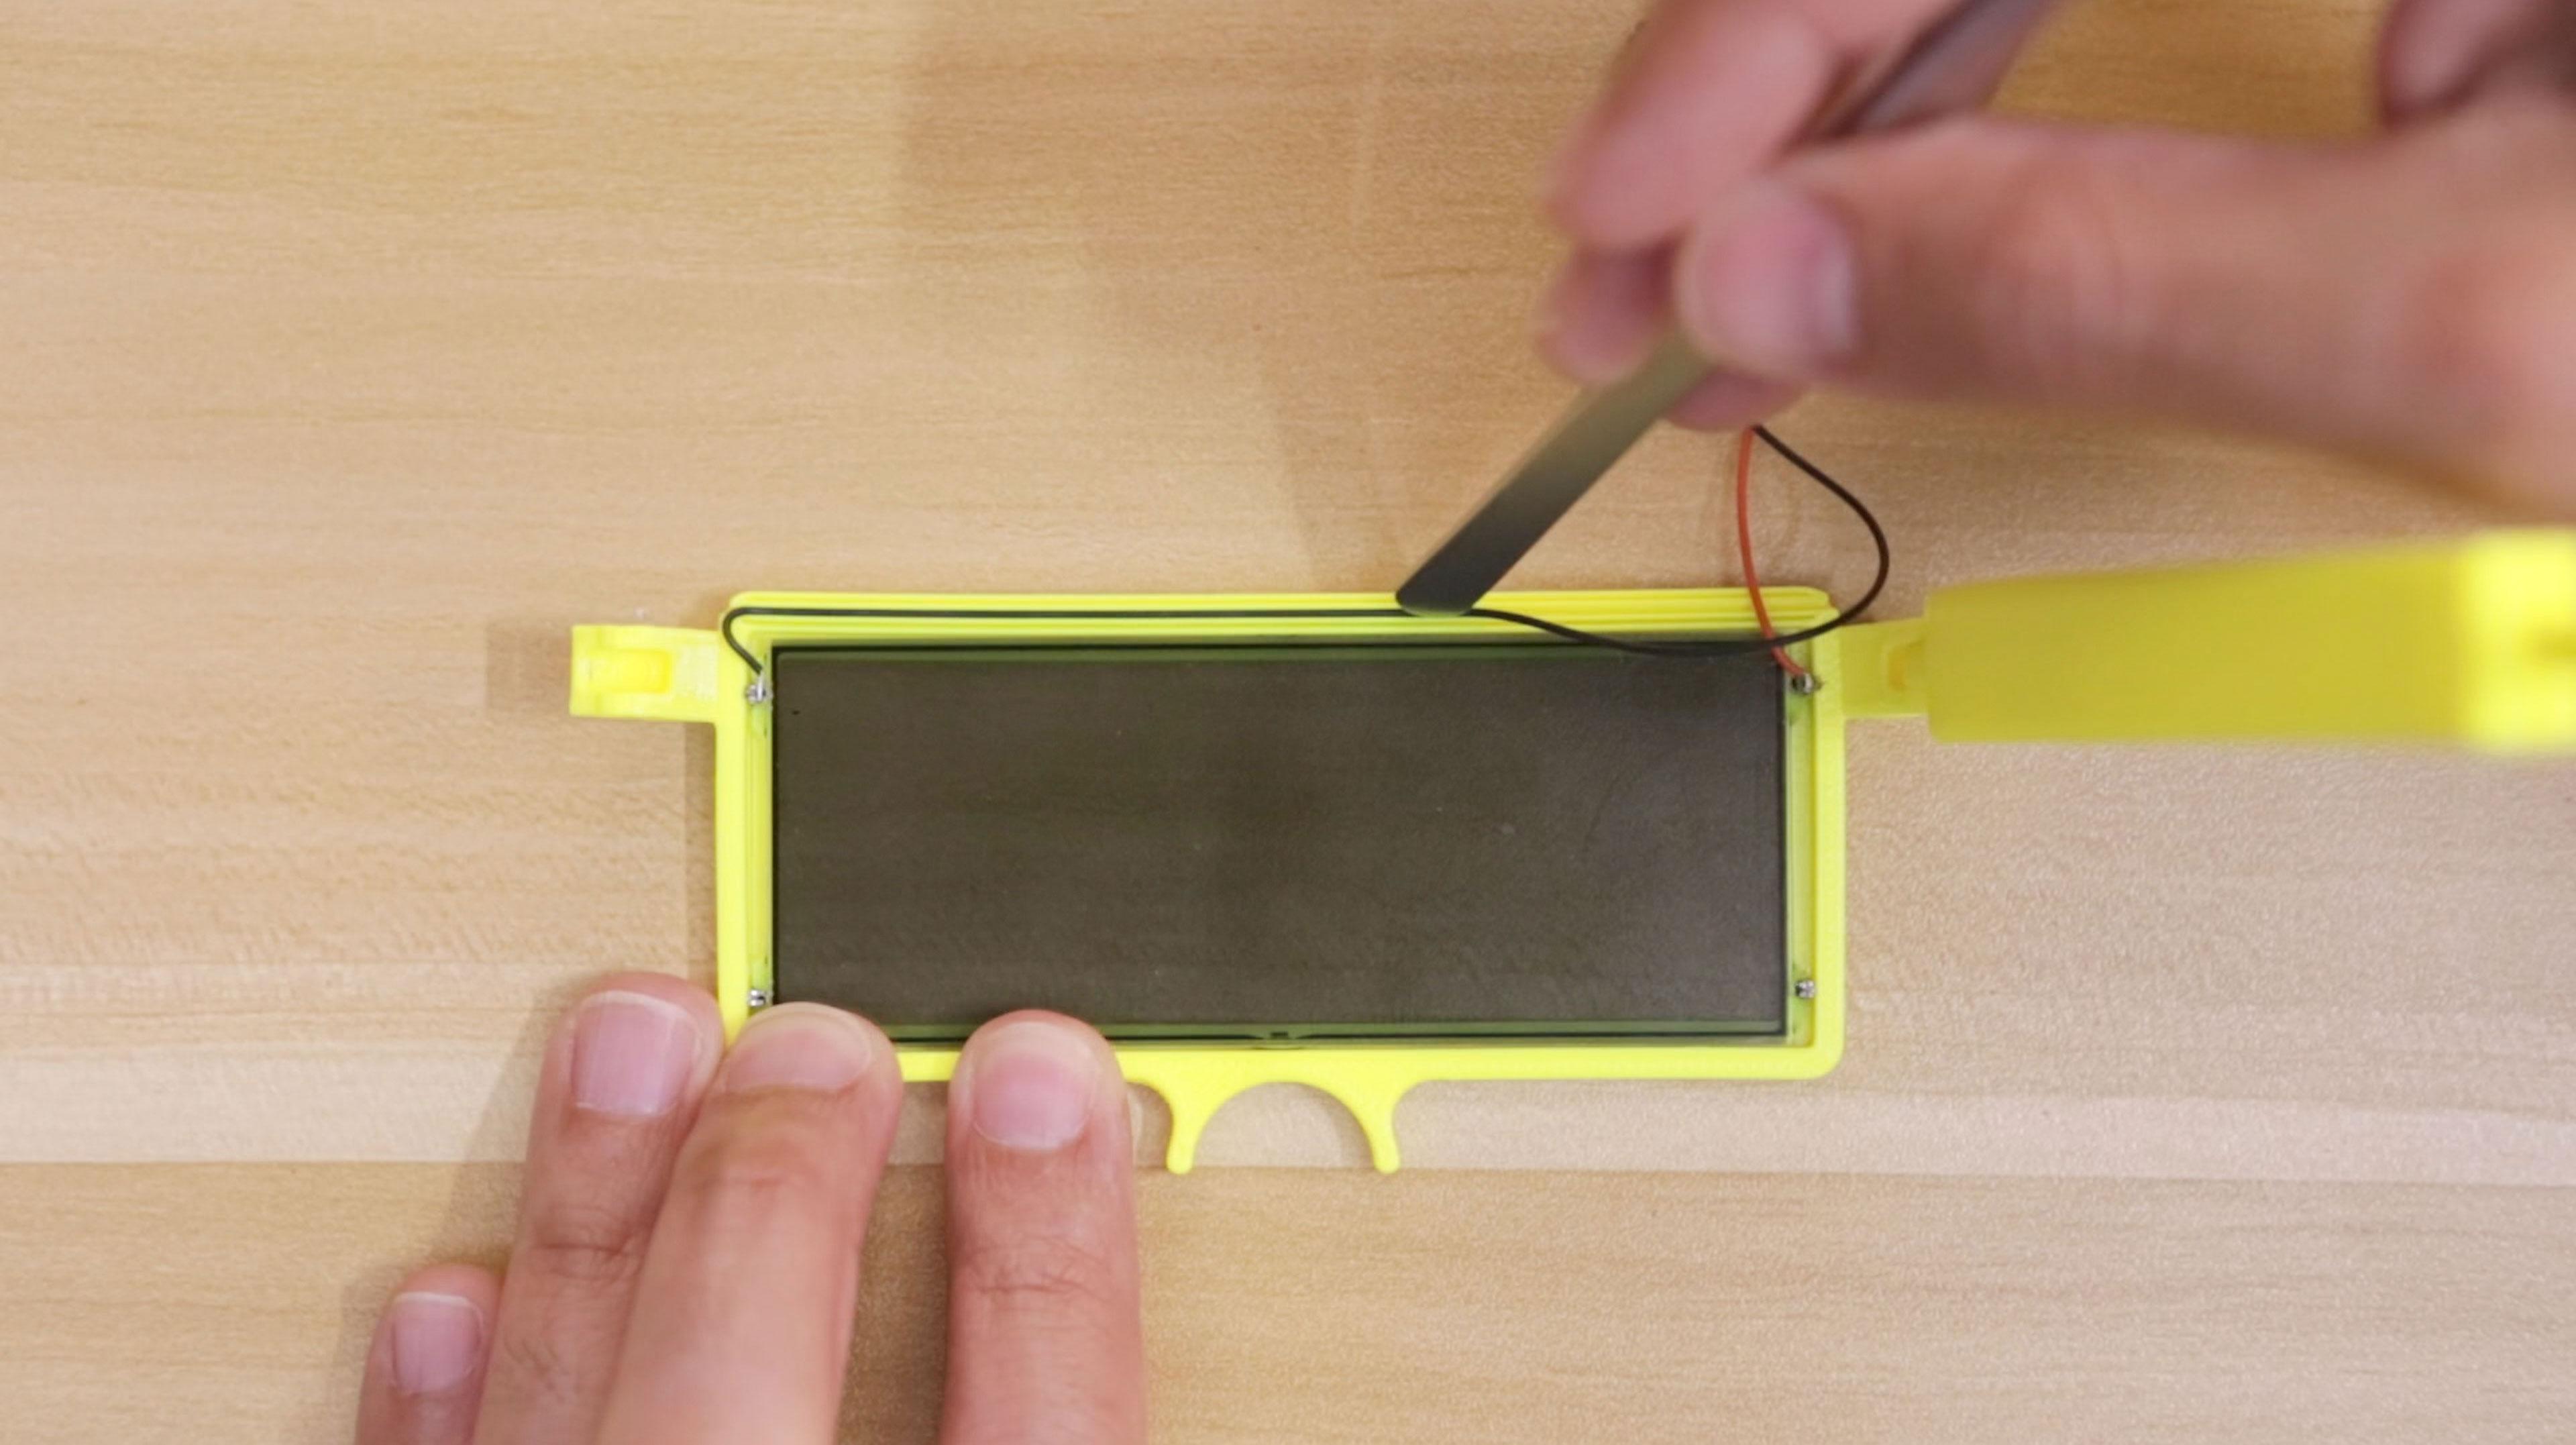 lcds___displays_lcd-wire-press-fit.jpg